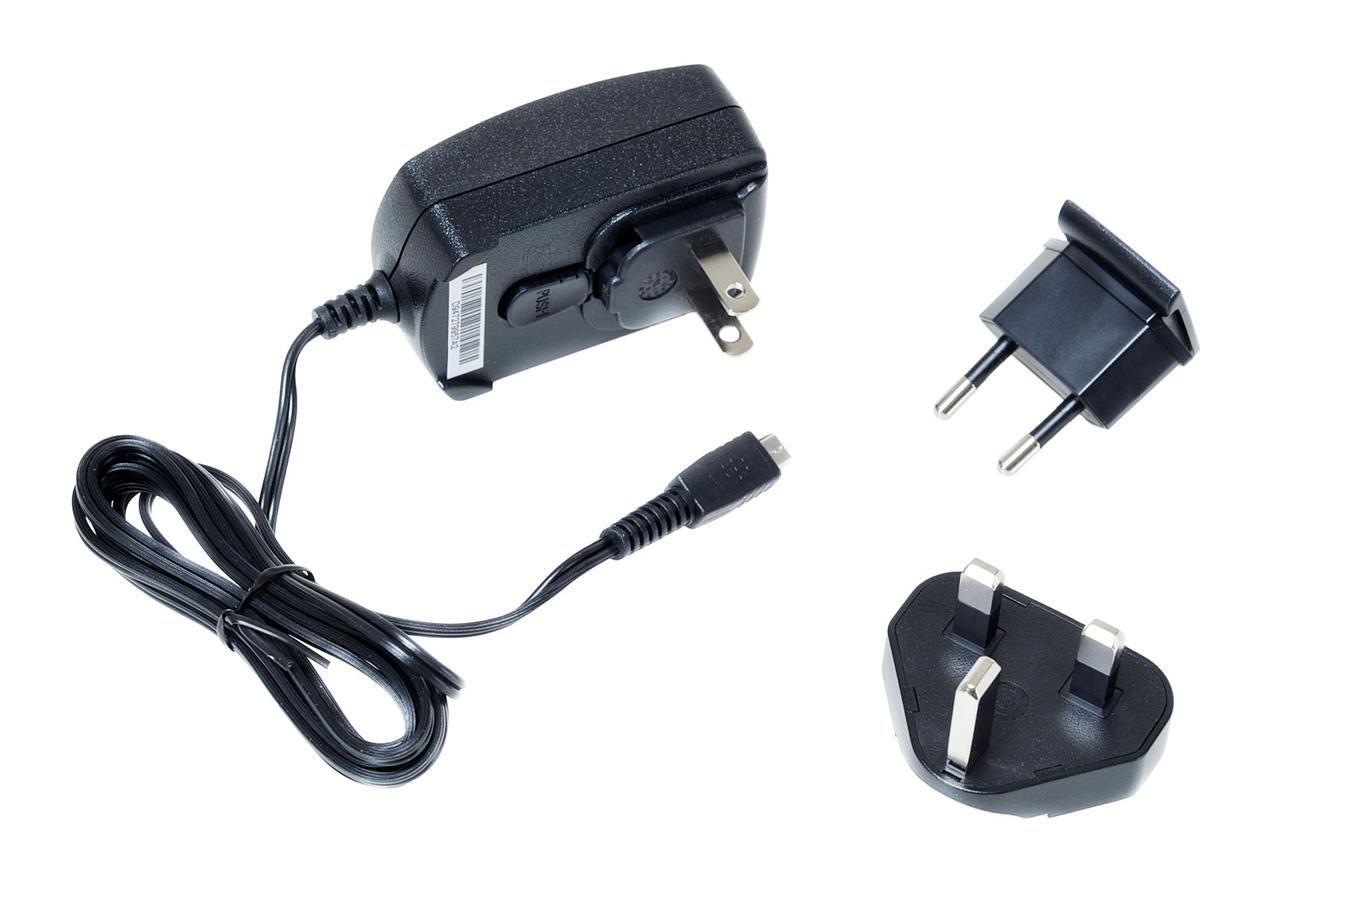 chargeur portable blackberry chargeur secteur micro usb 1293680 darty. Black Bedroom Furniture Sets. Home Design Ideas